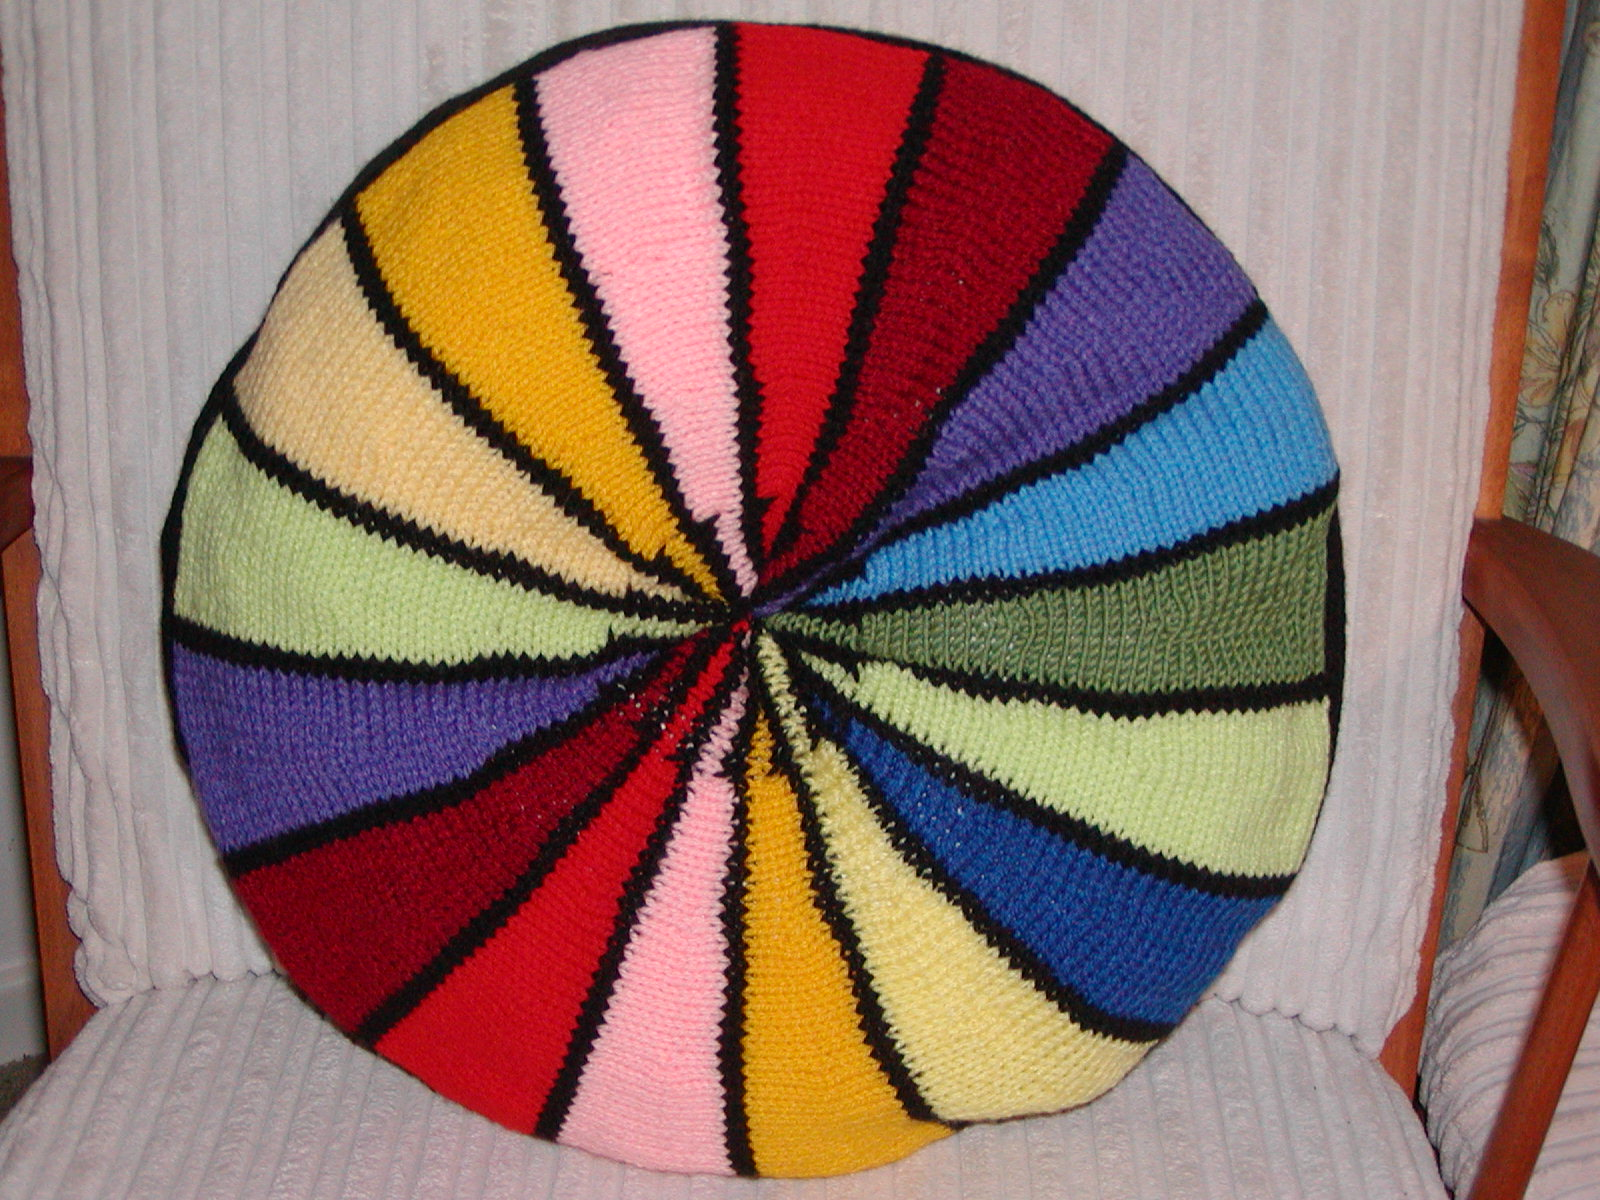 Lk150 Knitting Machine Patterns : Addicted to Machine Knitting: Machine Knitting Patterns